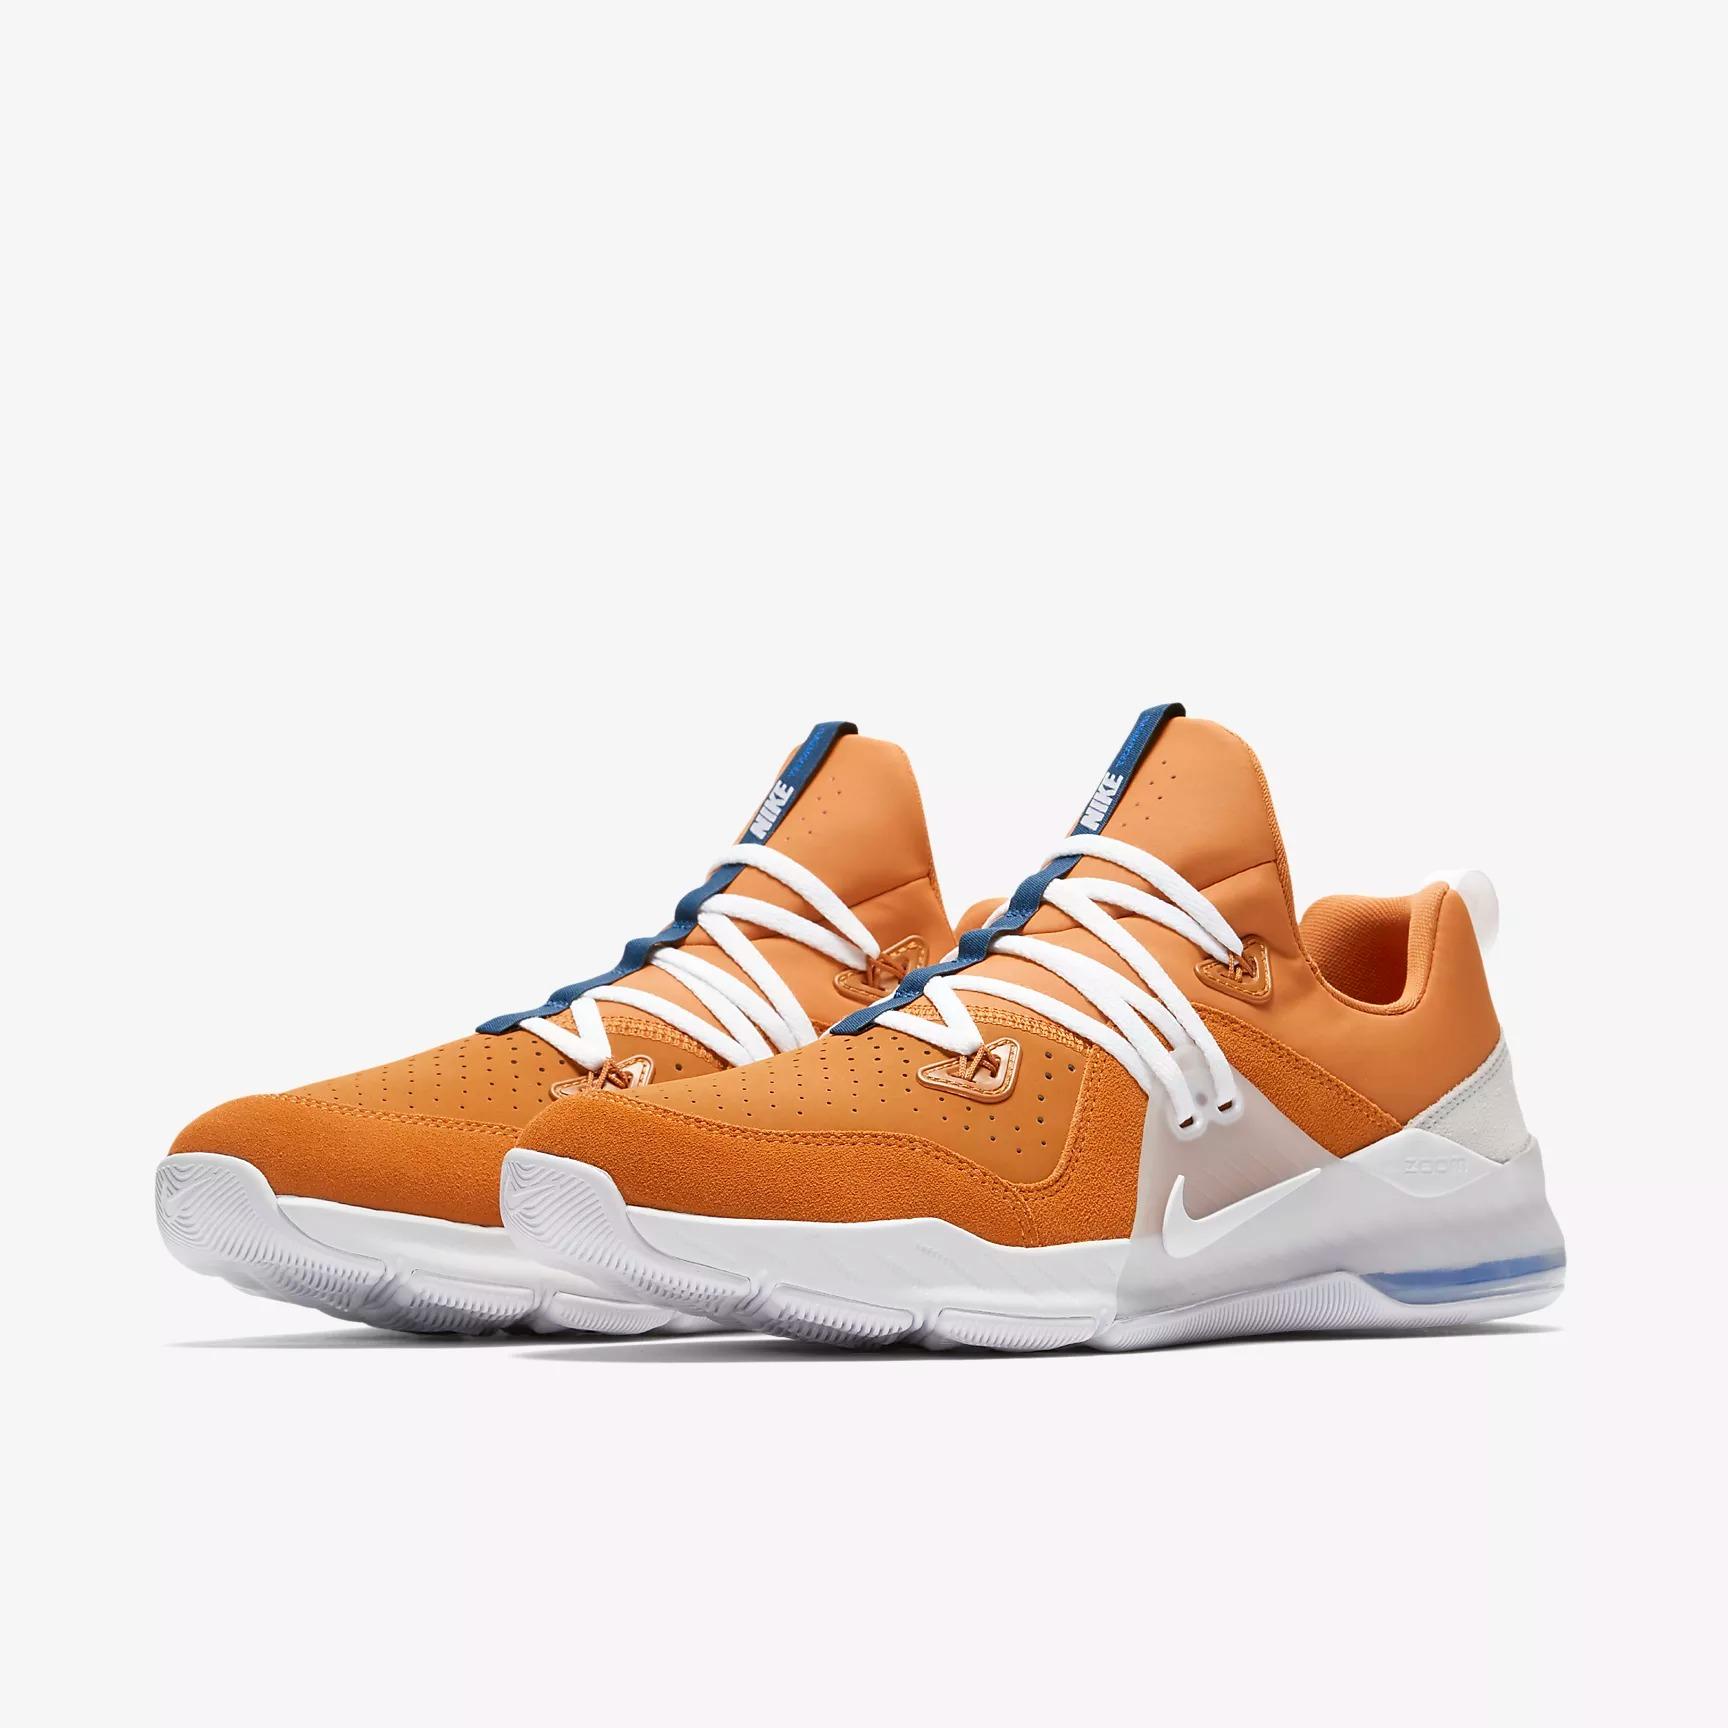 d998611b537e Nike Zoom Train Command Leather Trainers - SPORT SHOES TRAINING SHOES -  Superfanas.lt